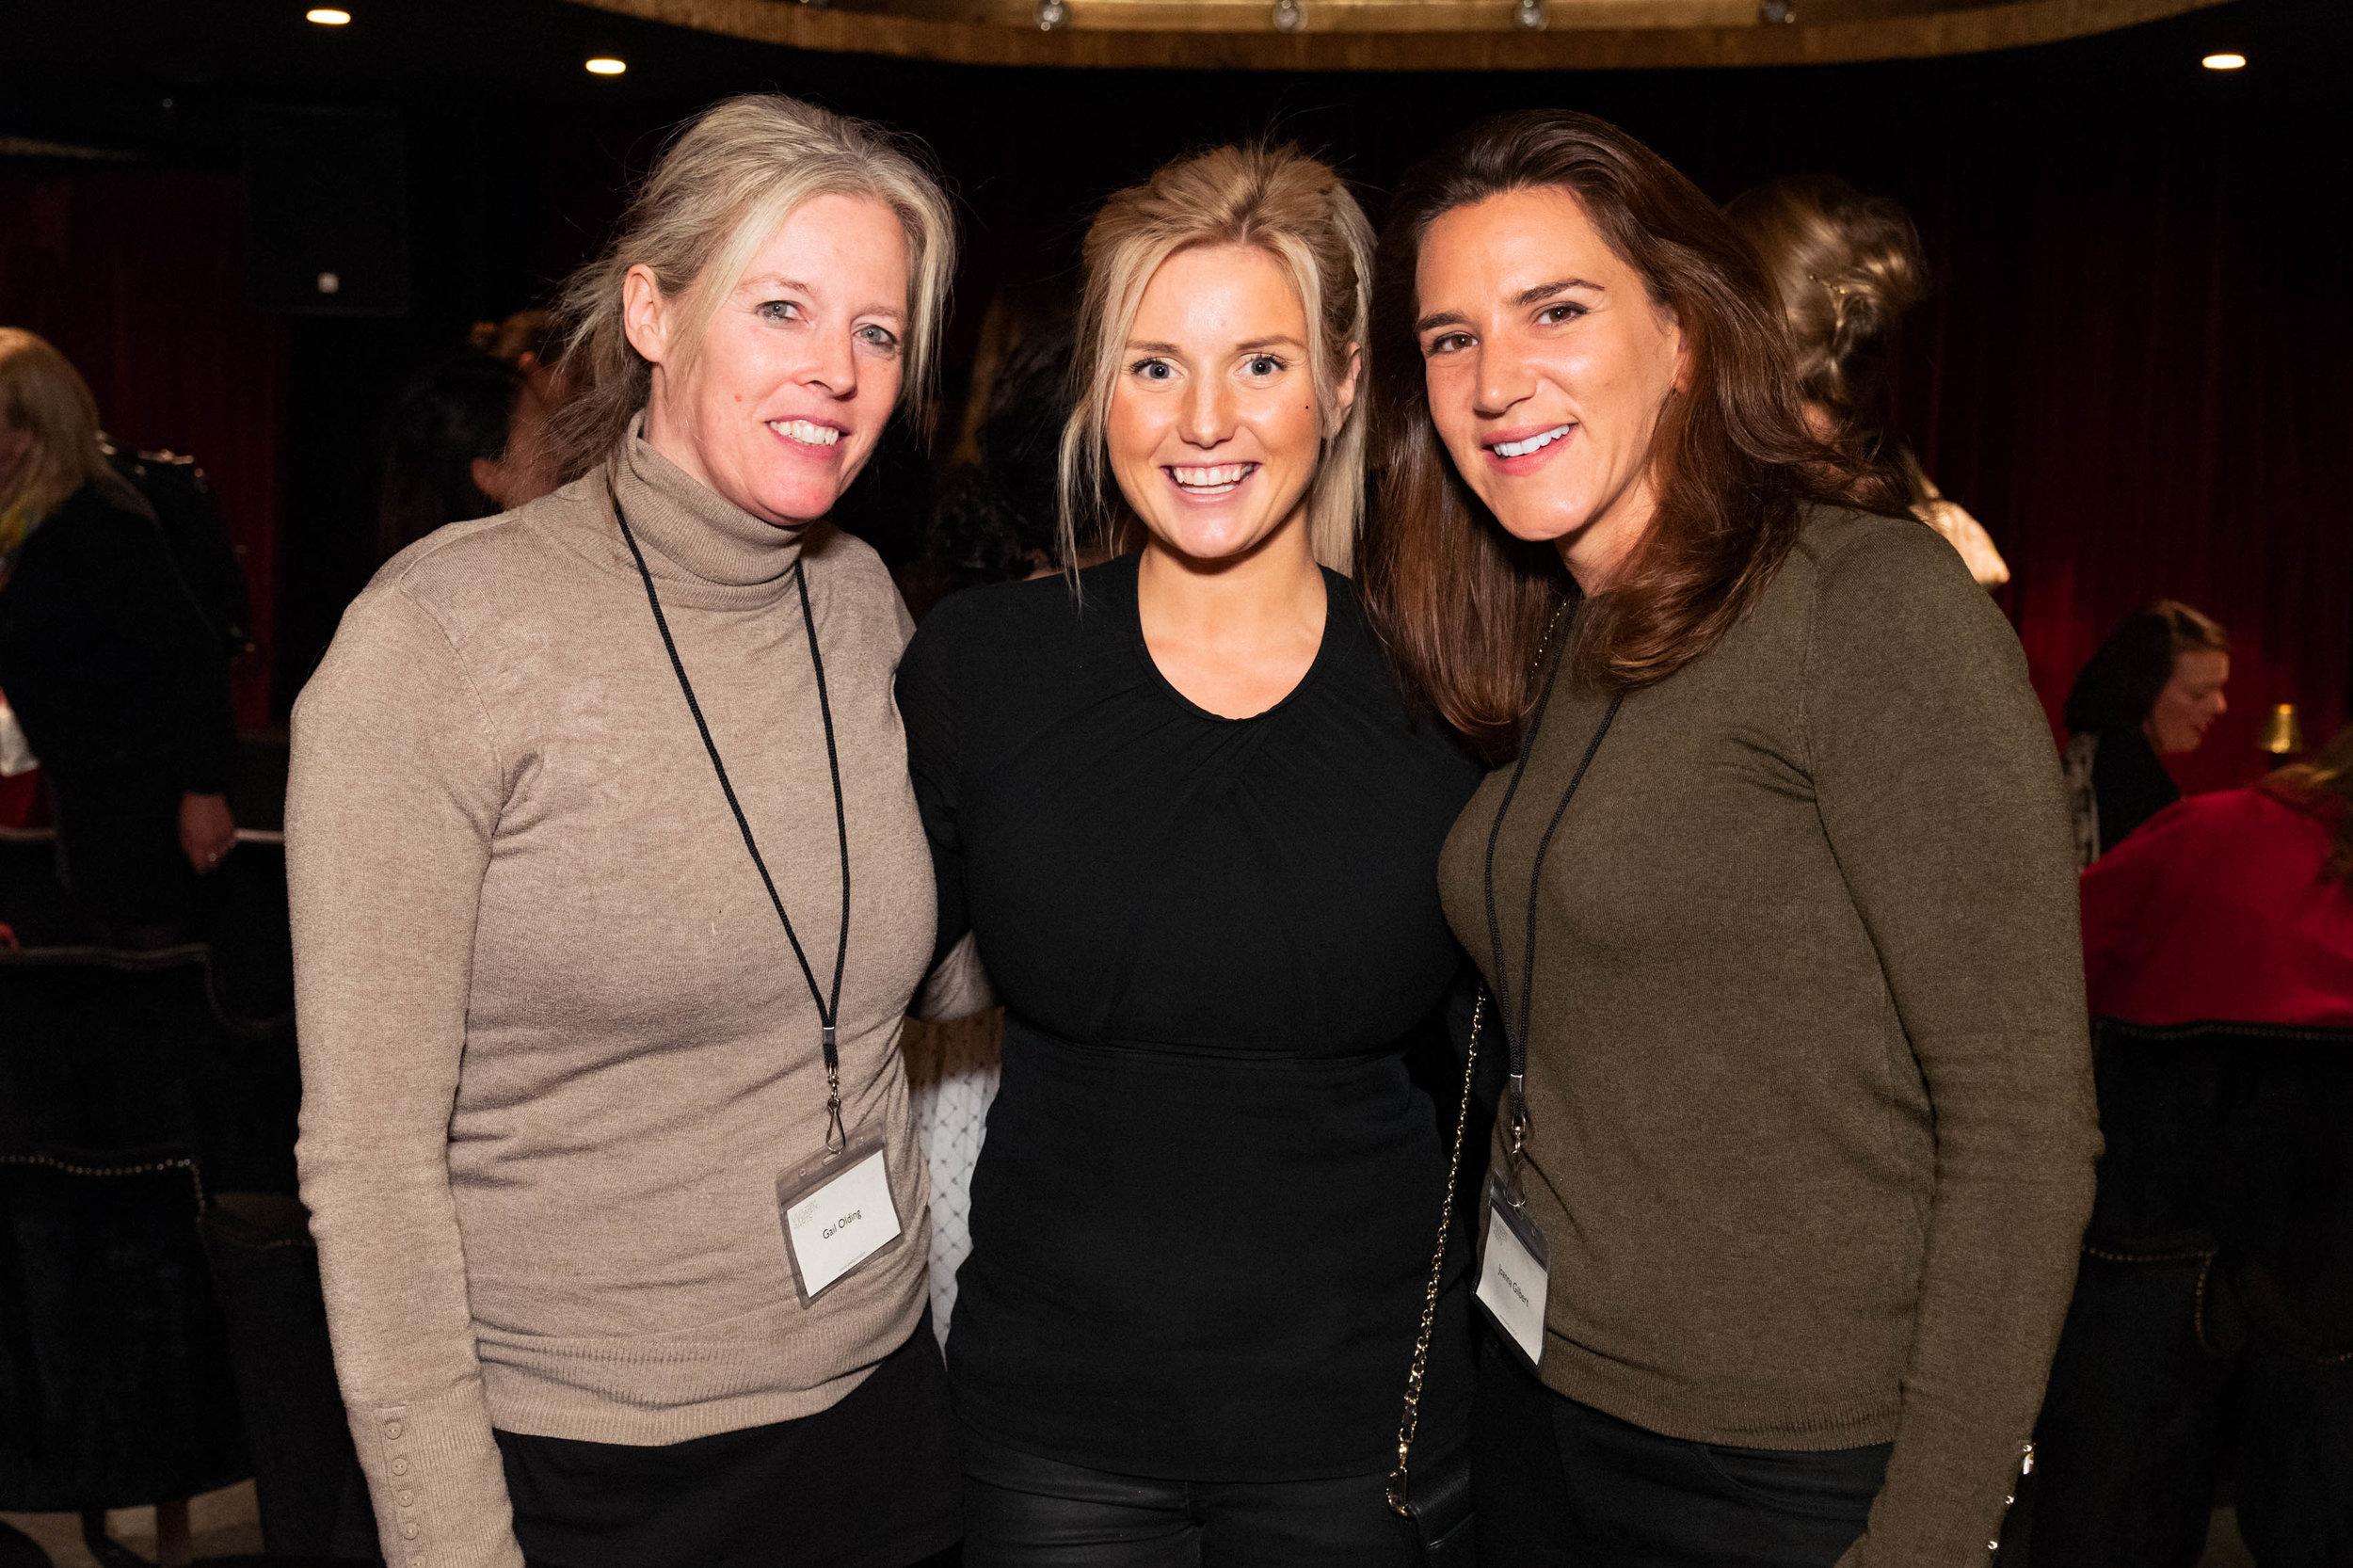 Gail Olding, Katrina Aleksa and Joanna Gilbert